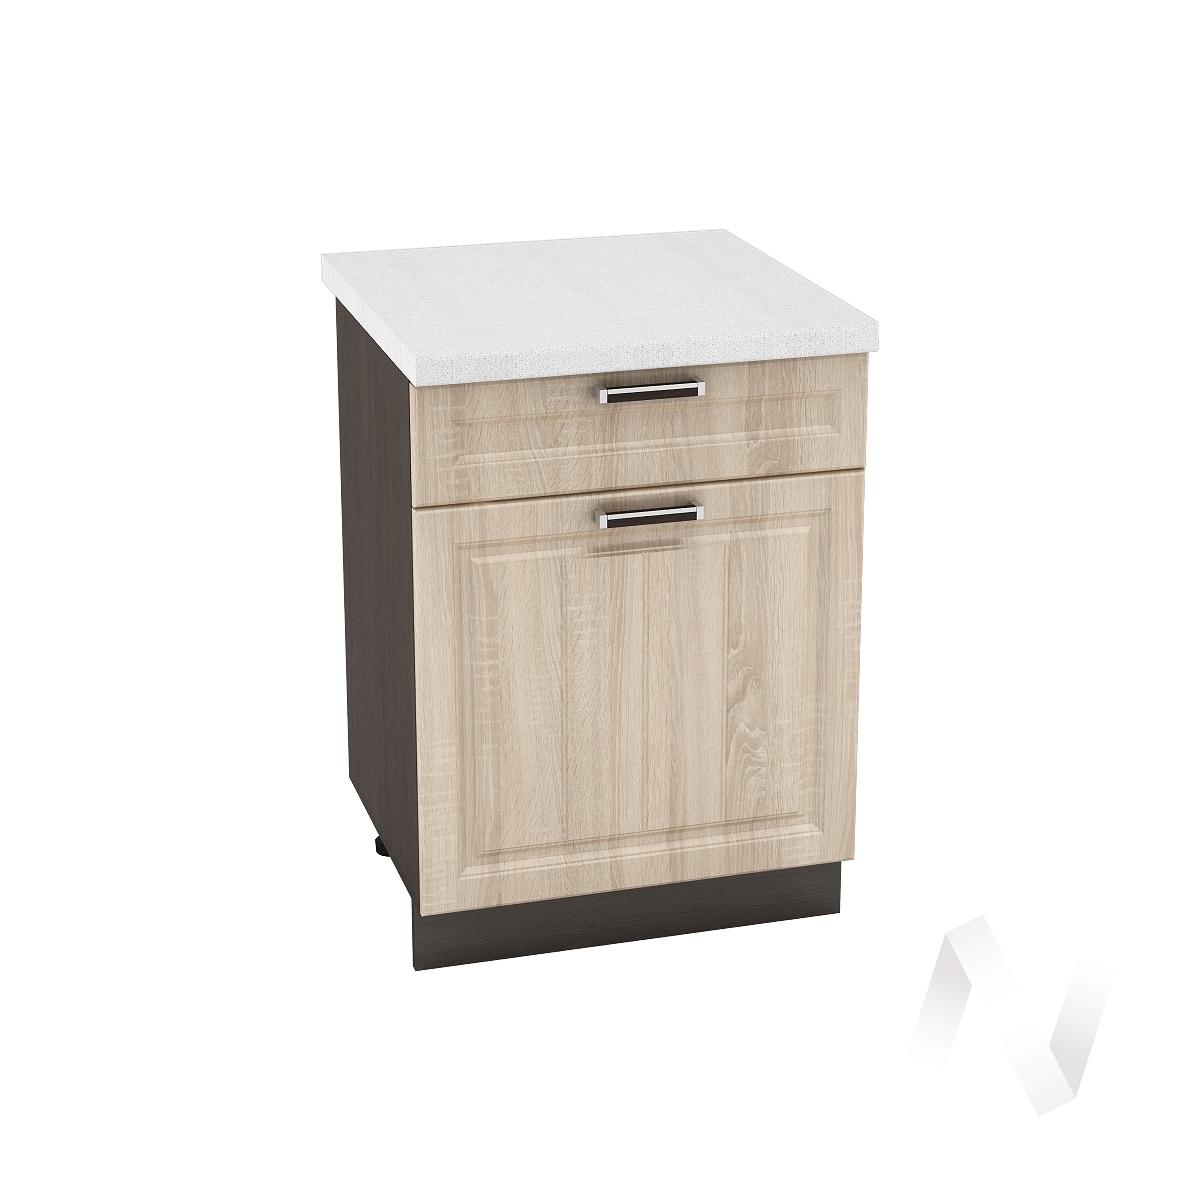 "Кухня ""Прага"": Шкаф нижний с ящиком 600, ШН1Я 600 М (дуб сонома/корпус венге)"